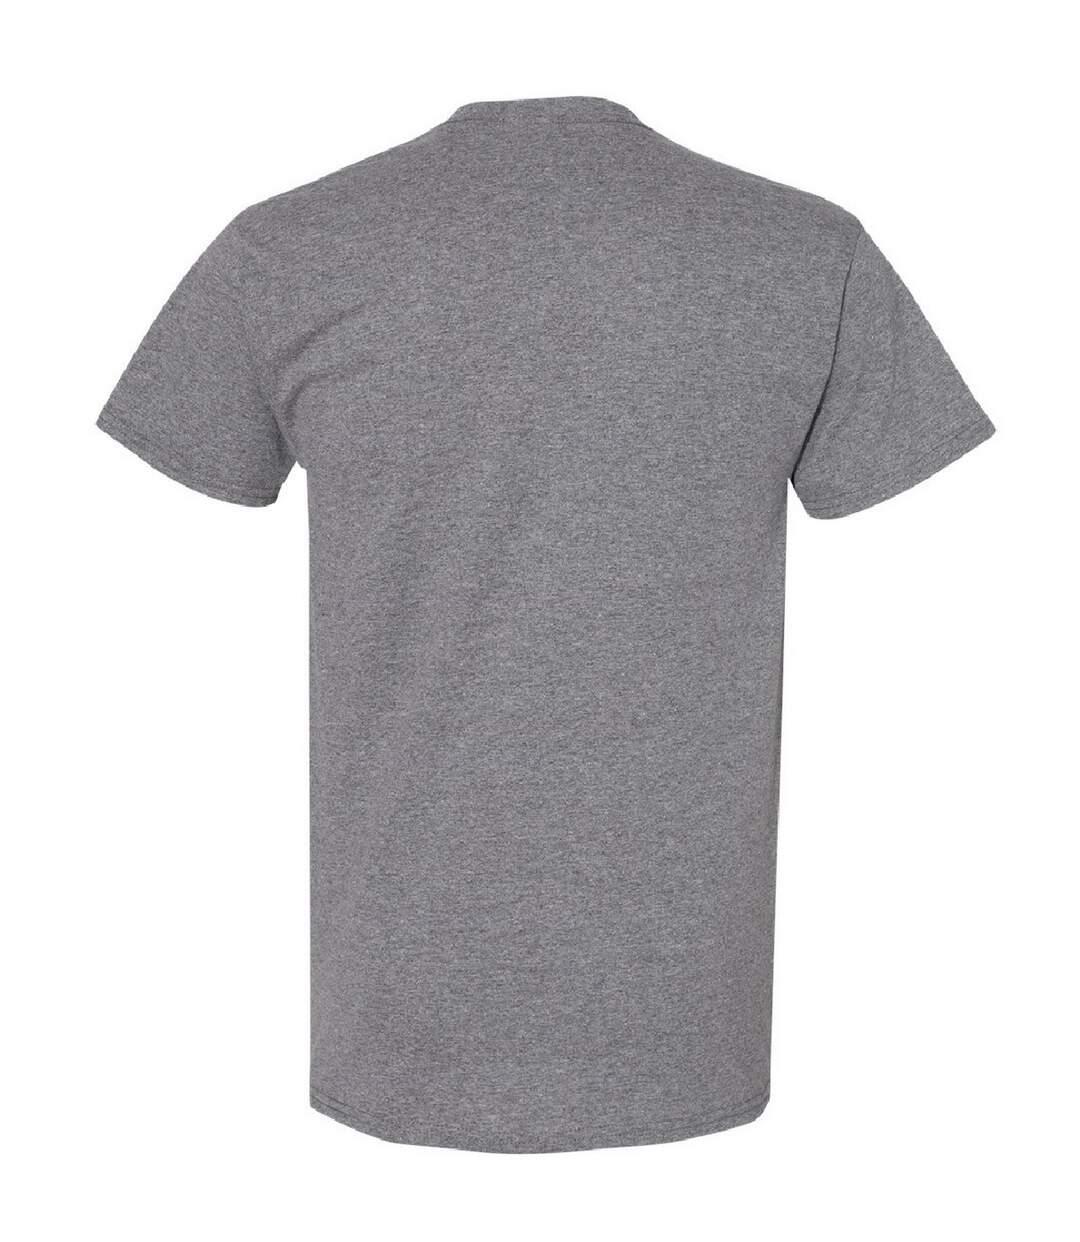 Gildan Mens Heavy Cotton Short Sleeve T-Shirt (Graphite Heather) - UTBC481